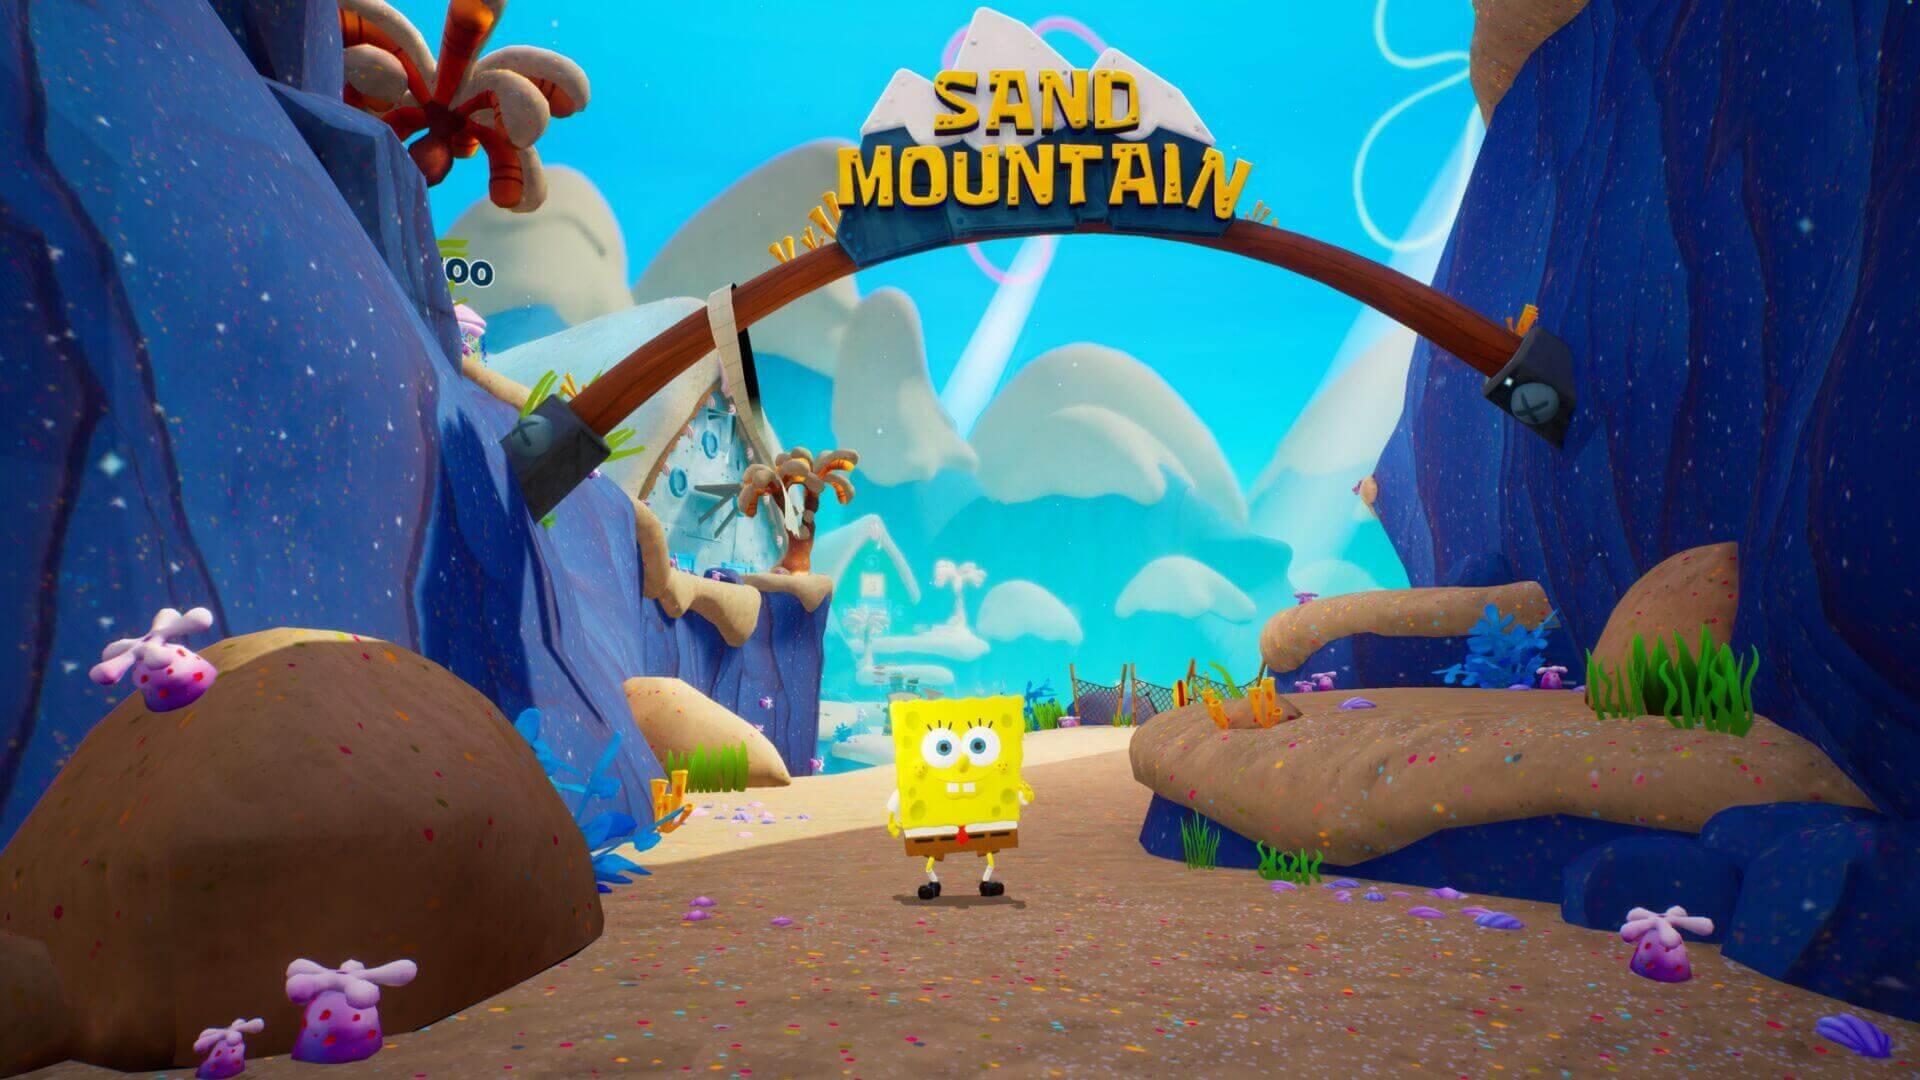 Análise SpongeBob SquarePants Battle for Bikini Bottom Rehydrated, SpongeBob SquarePants Battle for Bikini Bottom Rehydrated, SpongeBob, Bob Esponja, THQ Nordic, Delfos